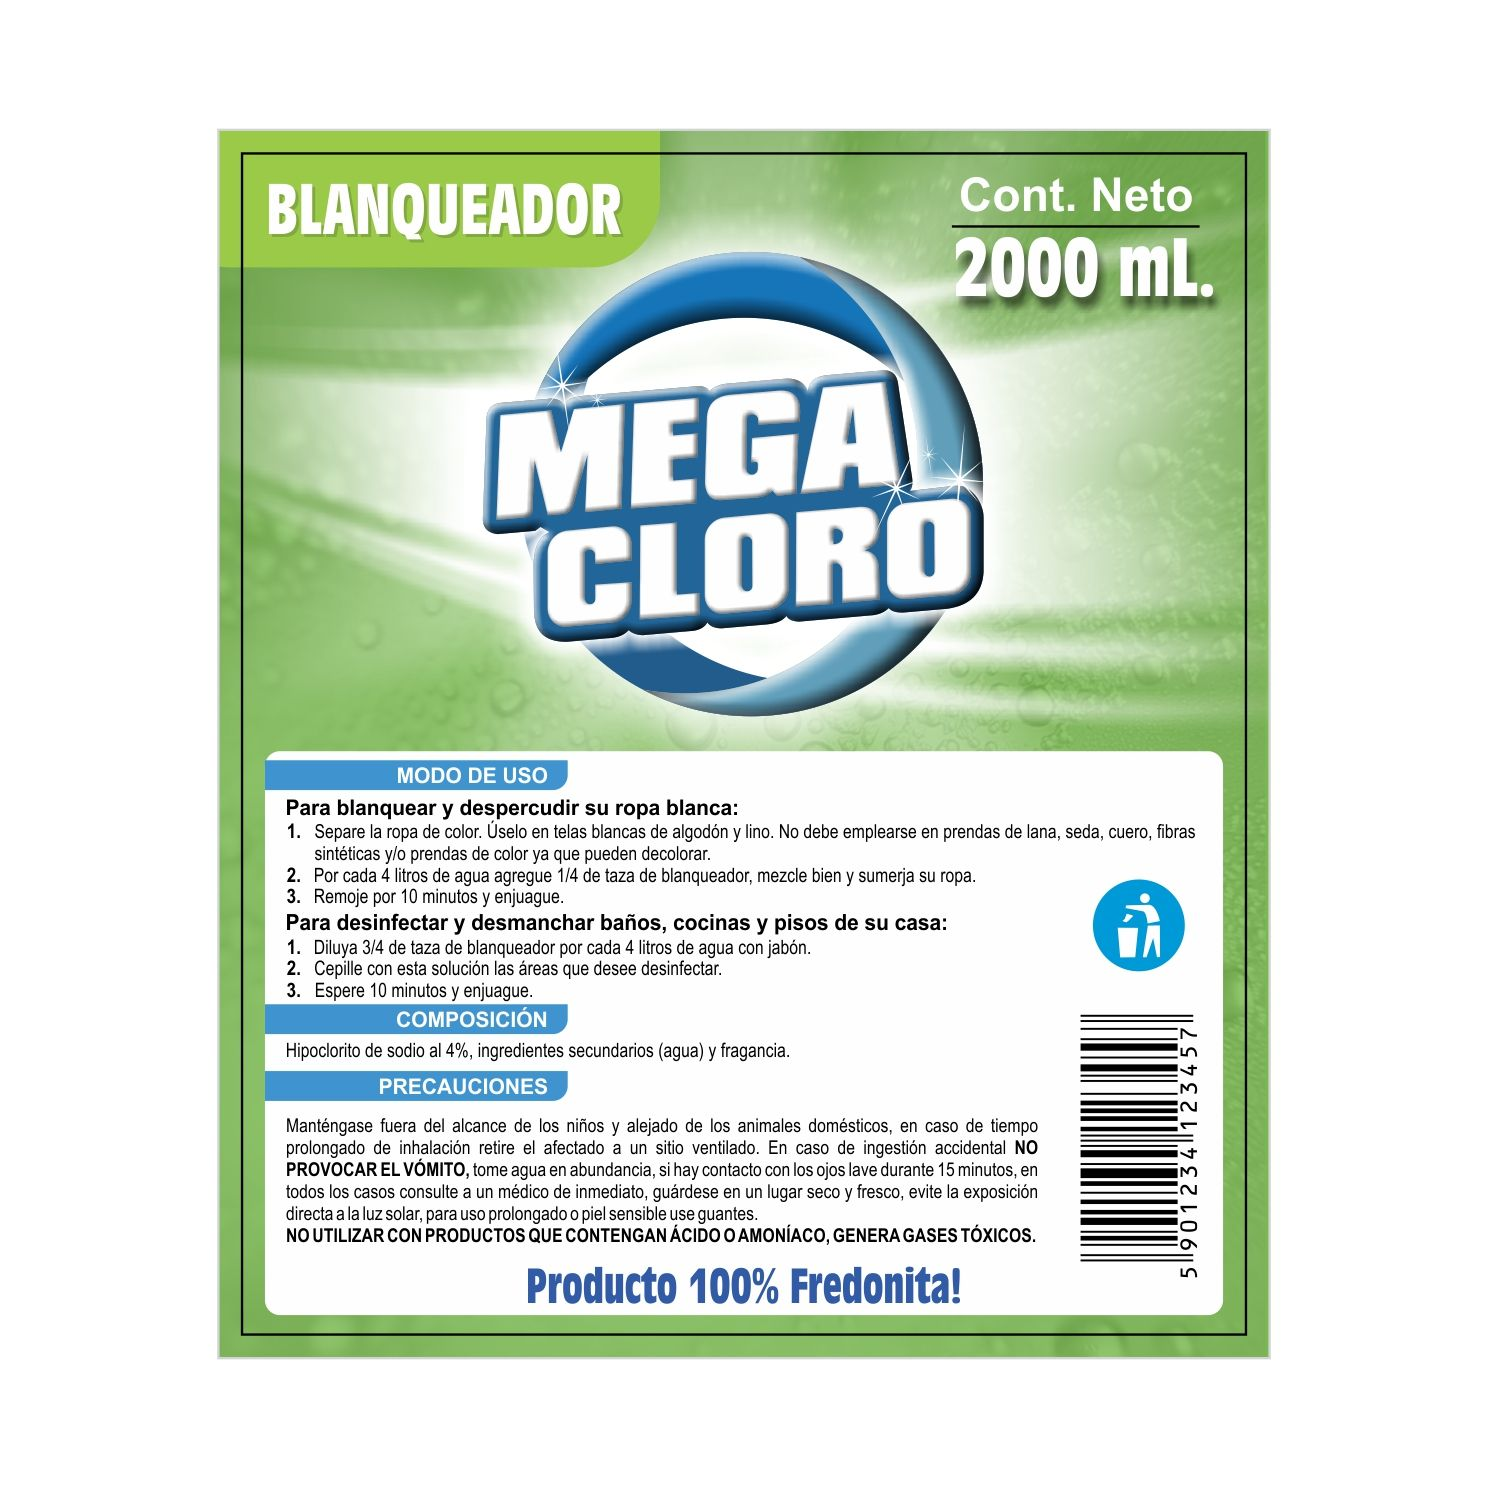 Etiqueta MEGA-CLORO  •  Etiqueta para productos de limpieza.